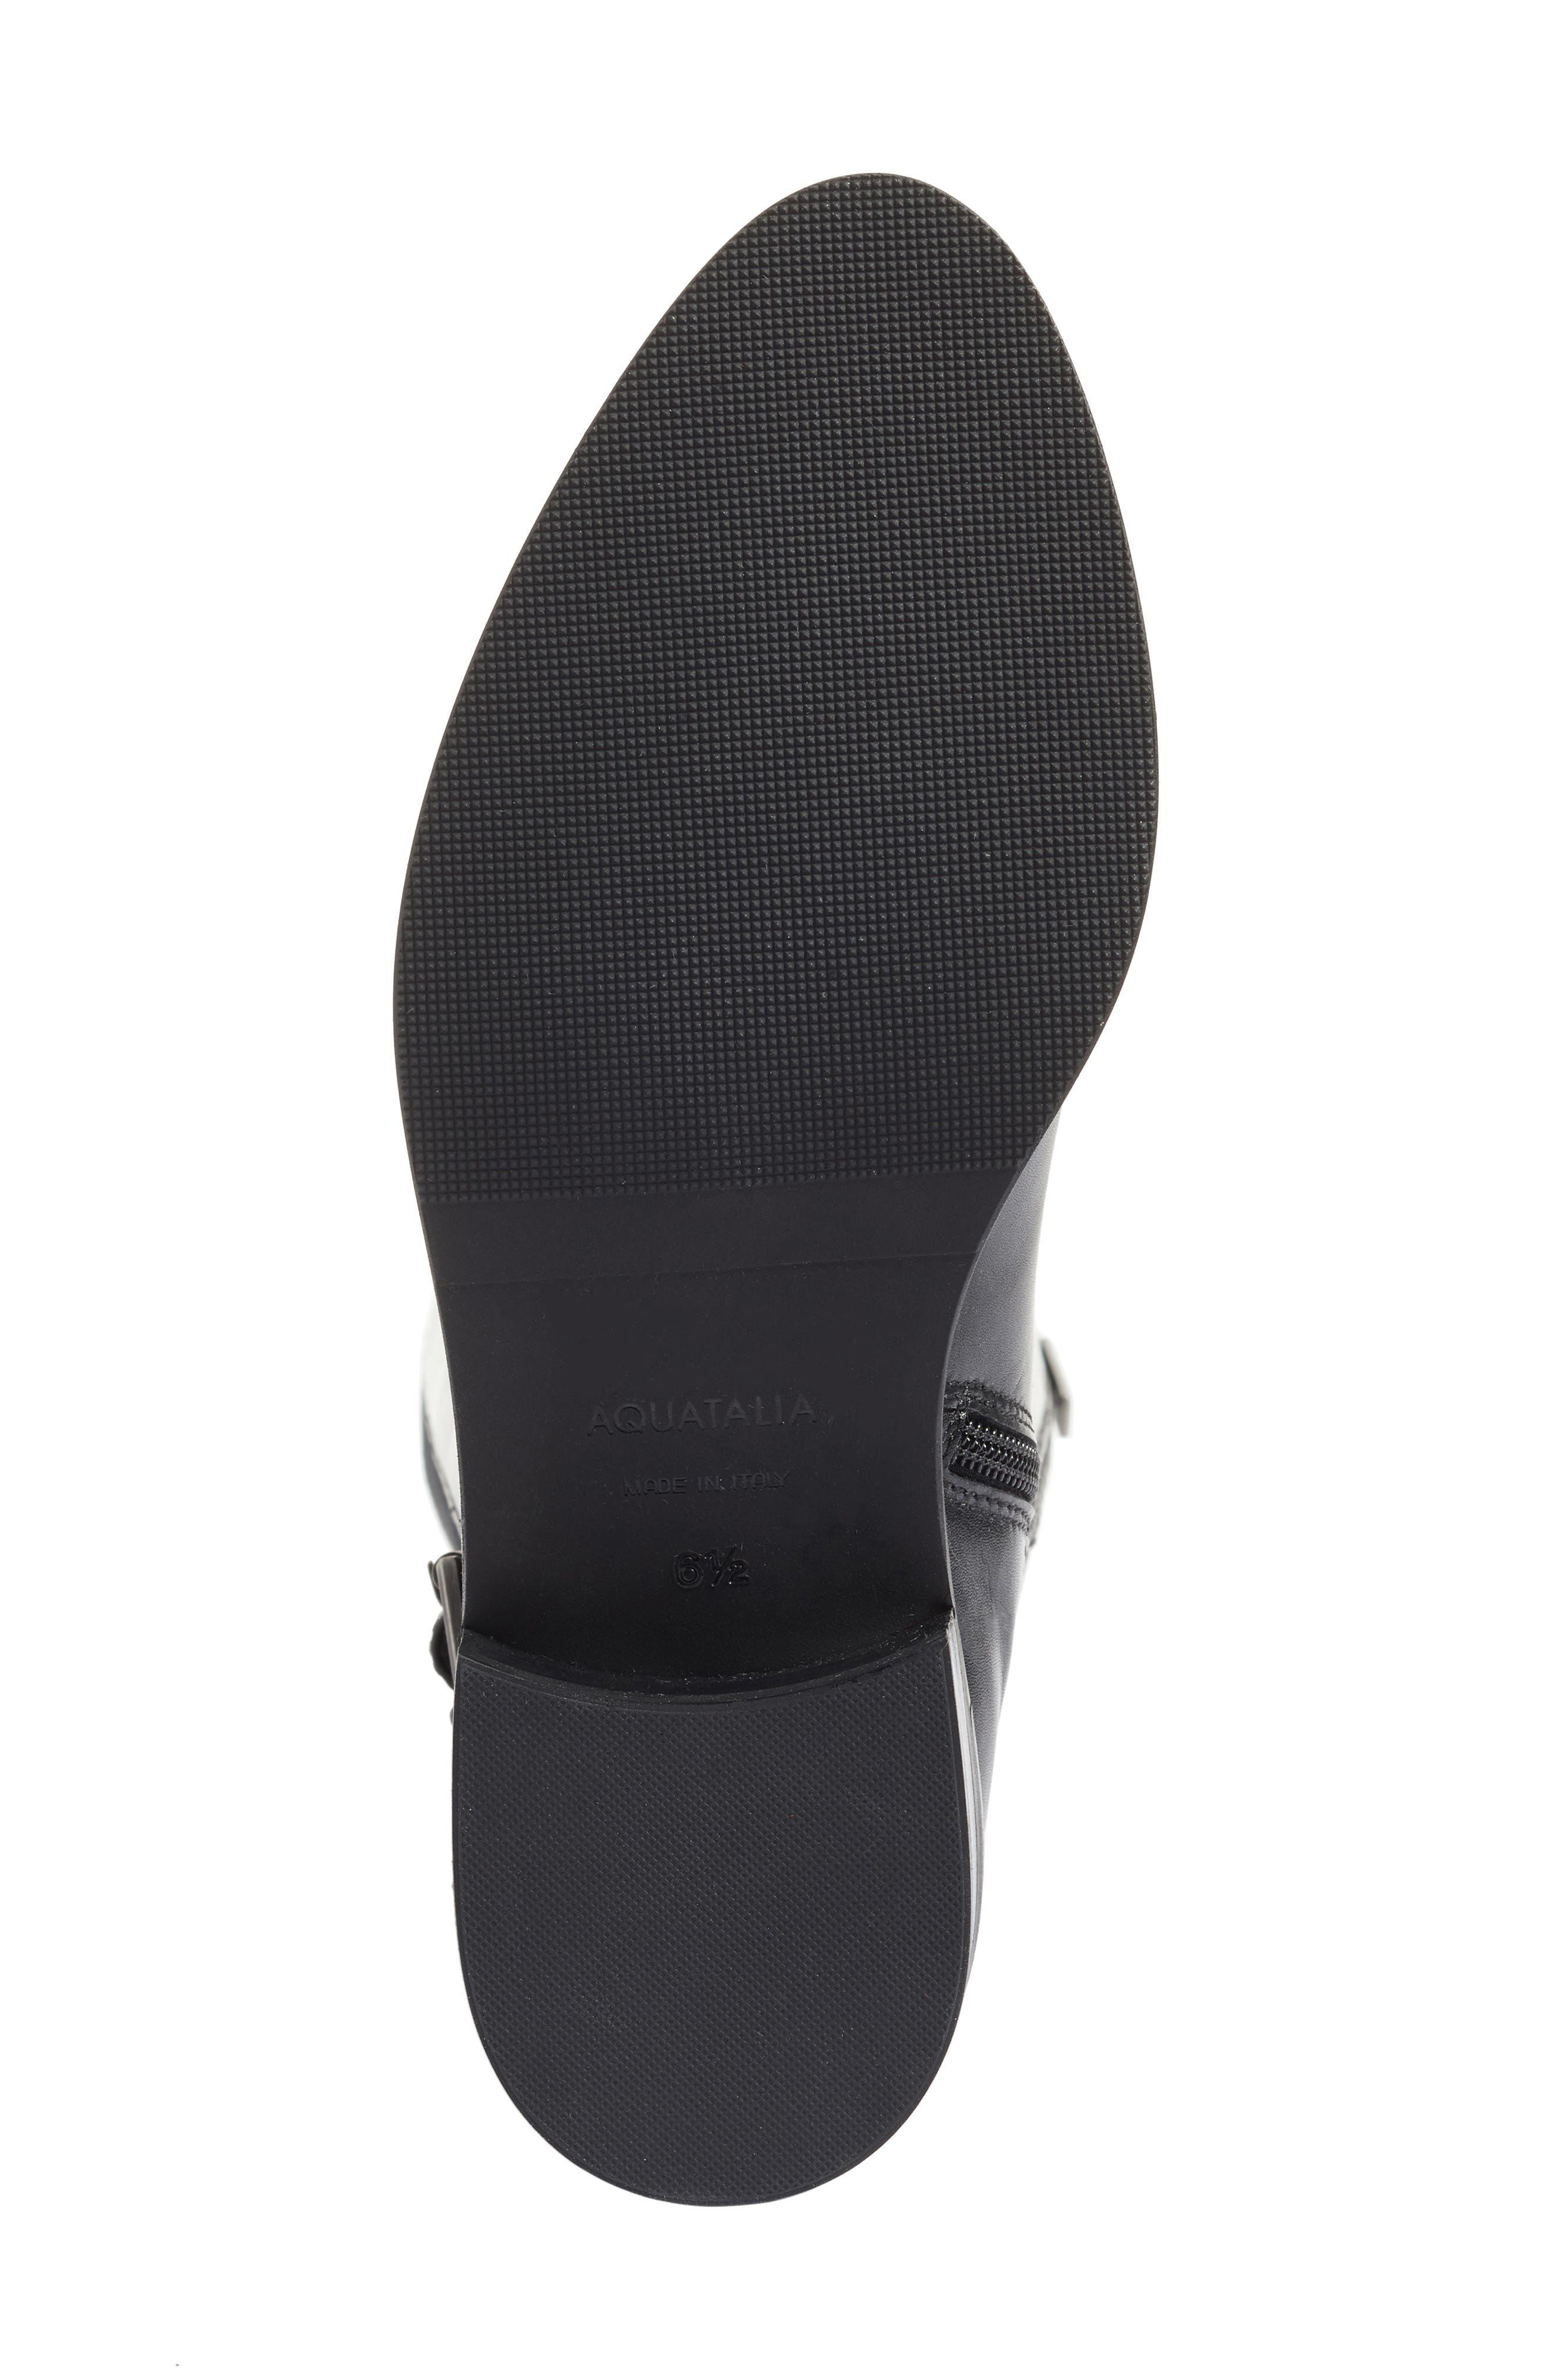 Genna Weatherproof Tall Boot,                             Alternate thumbnail 7, color,                             Black Calf/ Elastic/ Suede